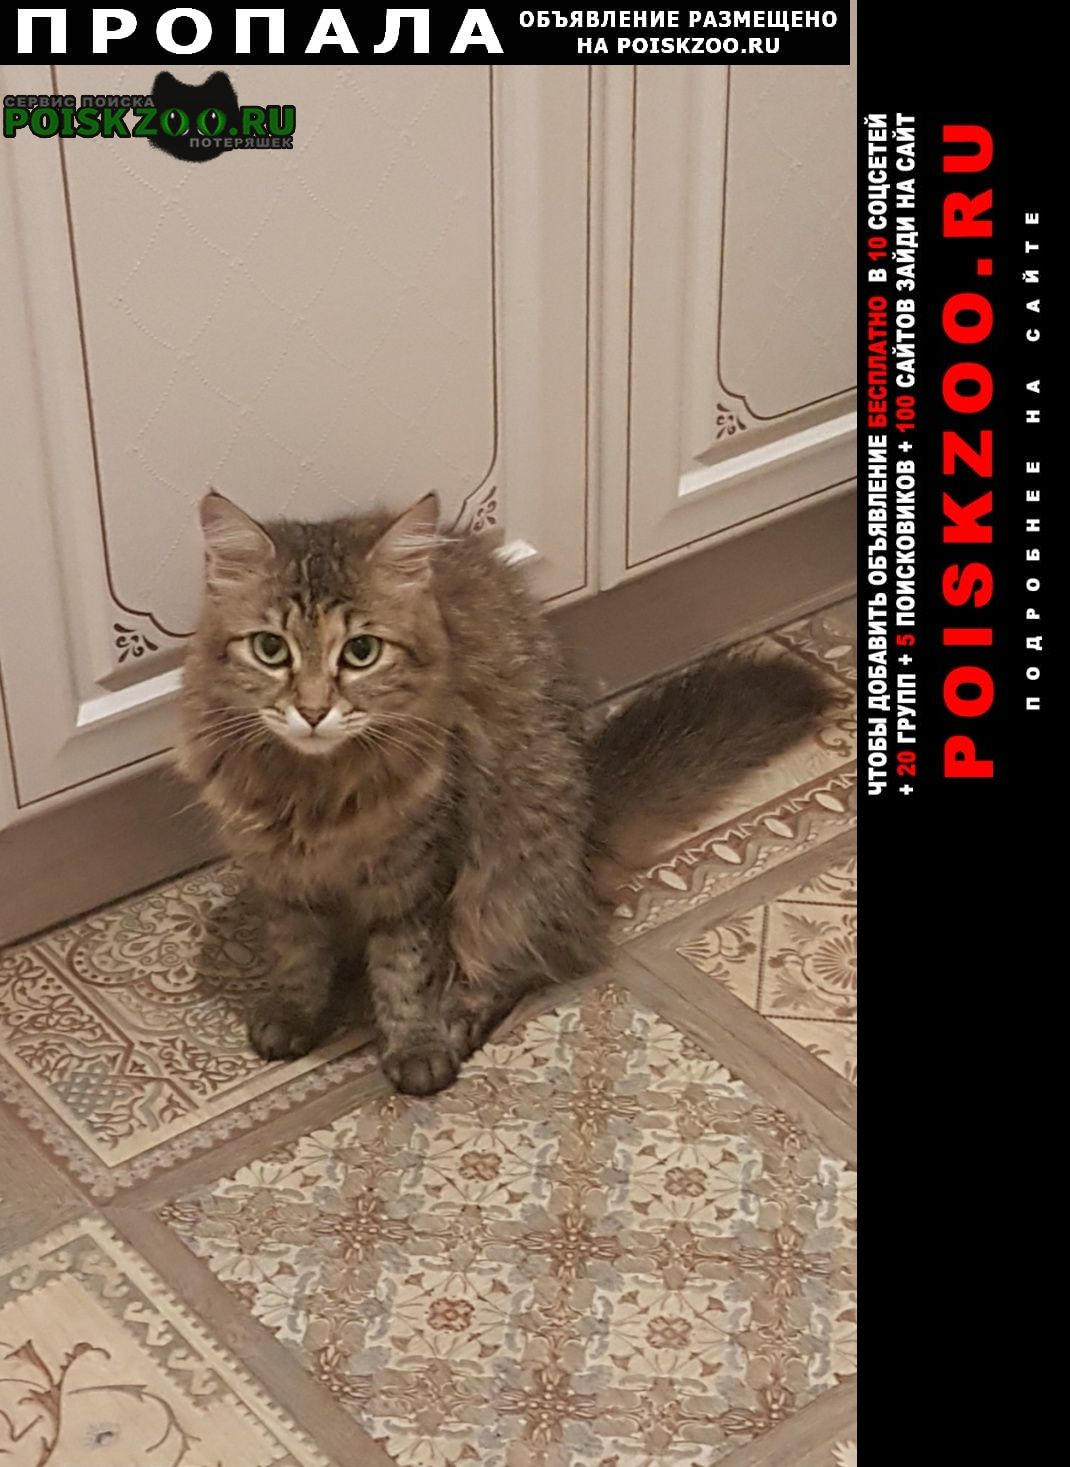 Краснодар Пропала кошка, помогите найти любимую кошечку